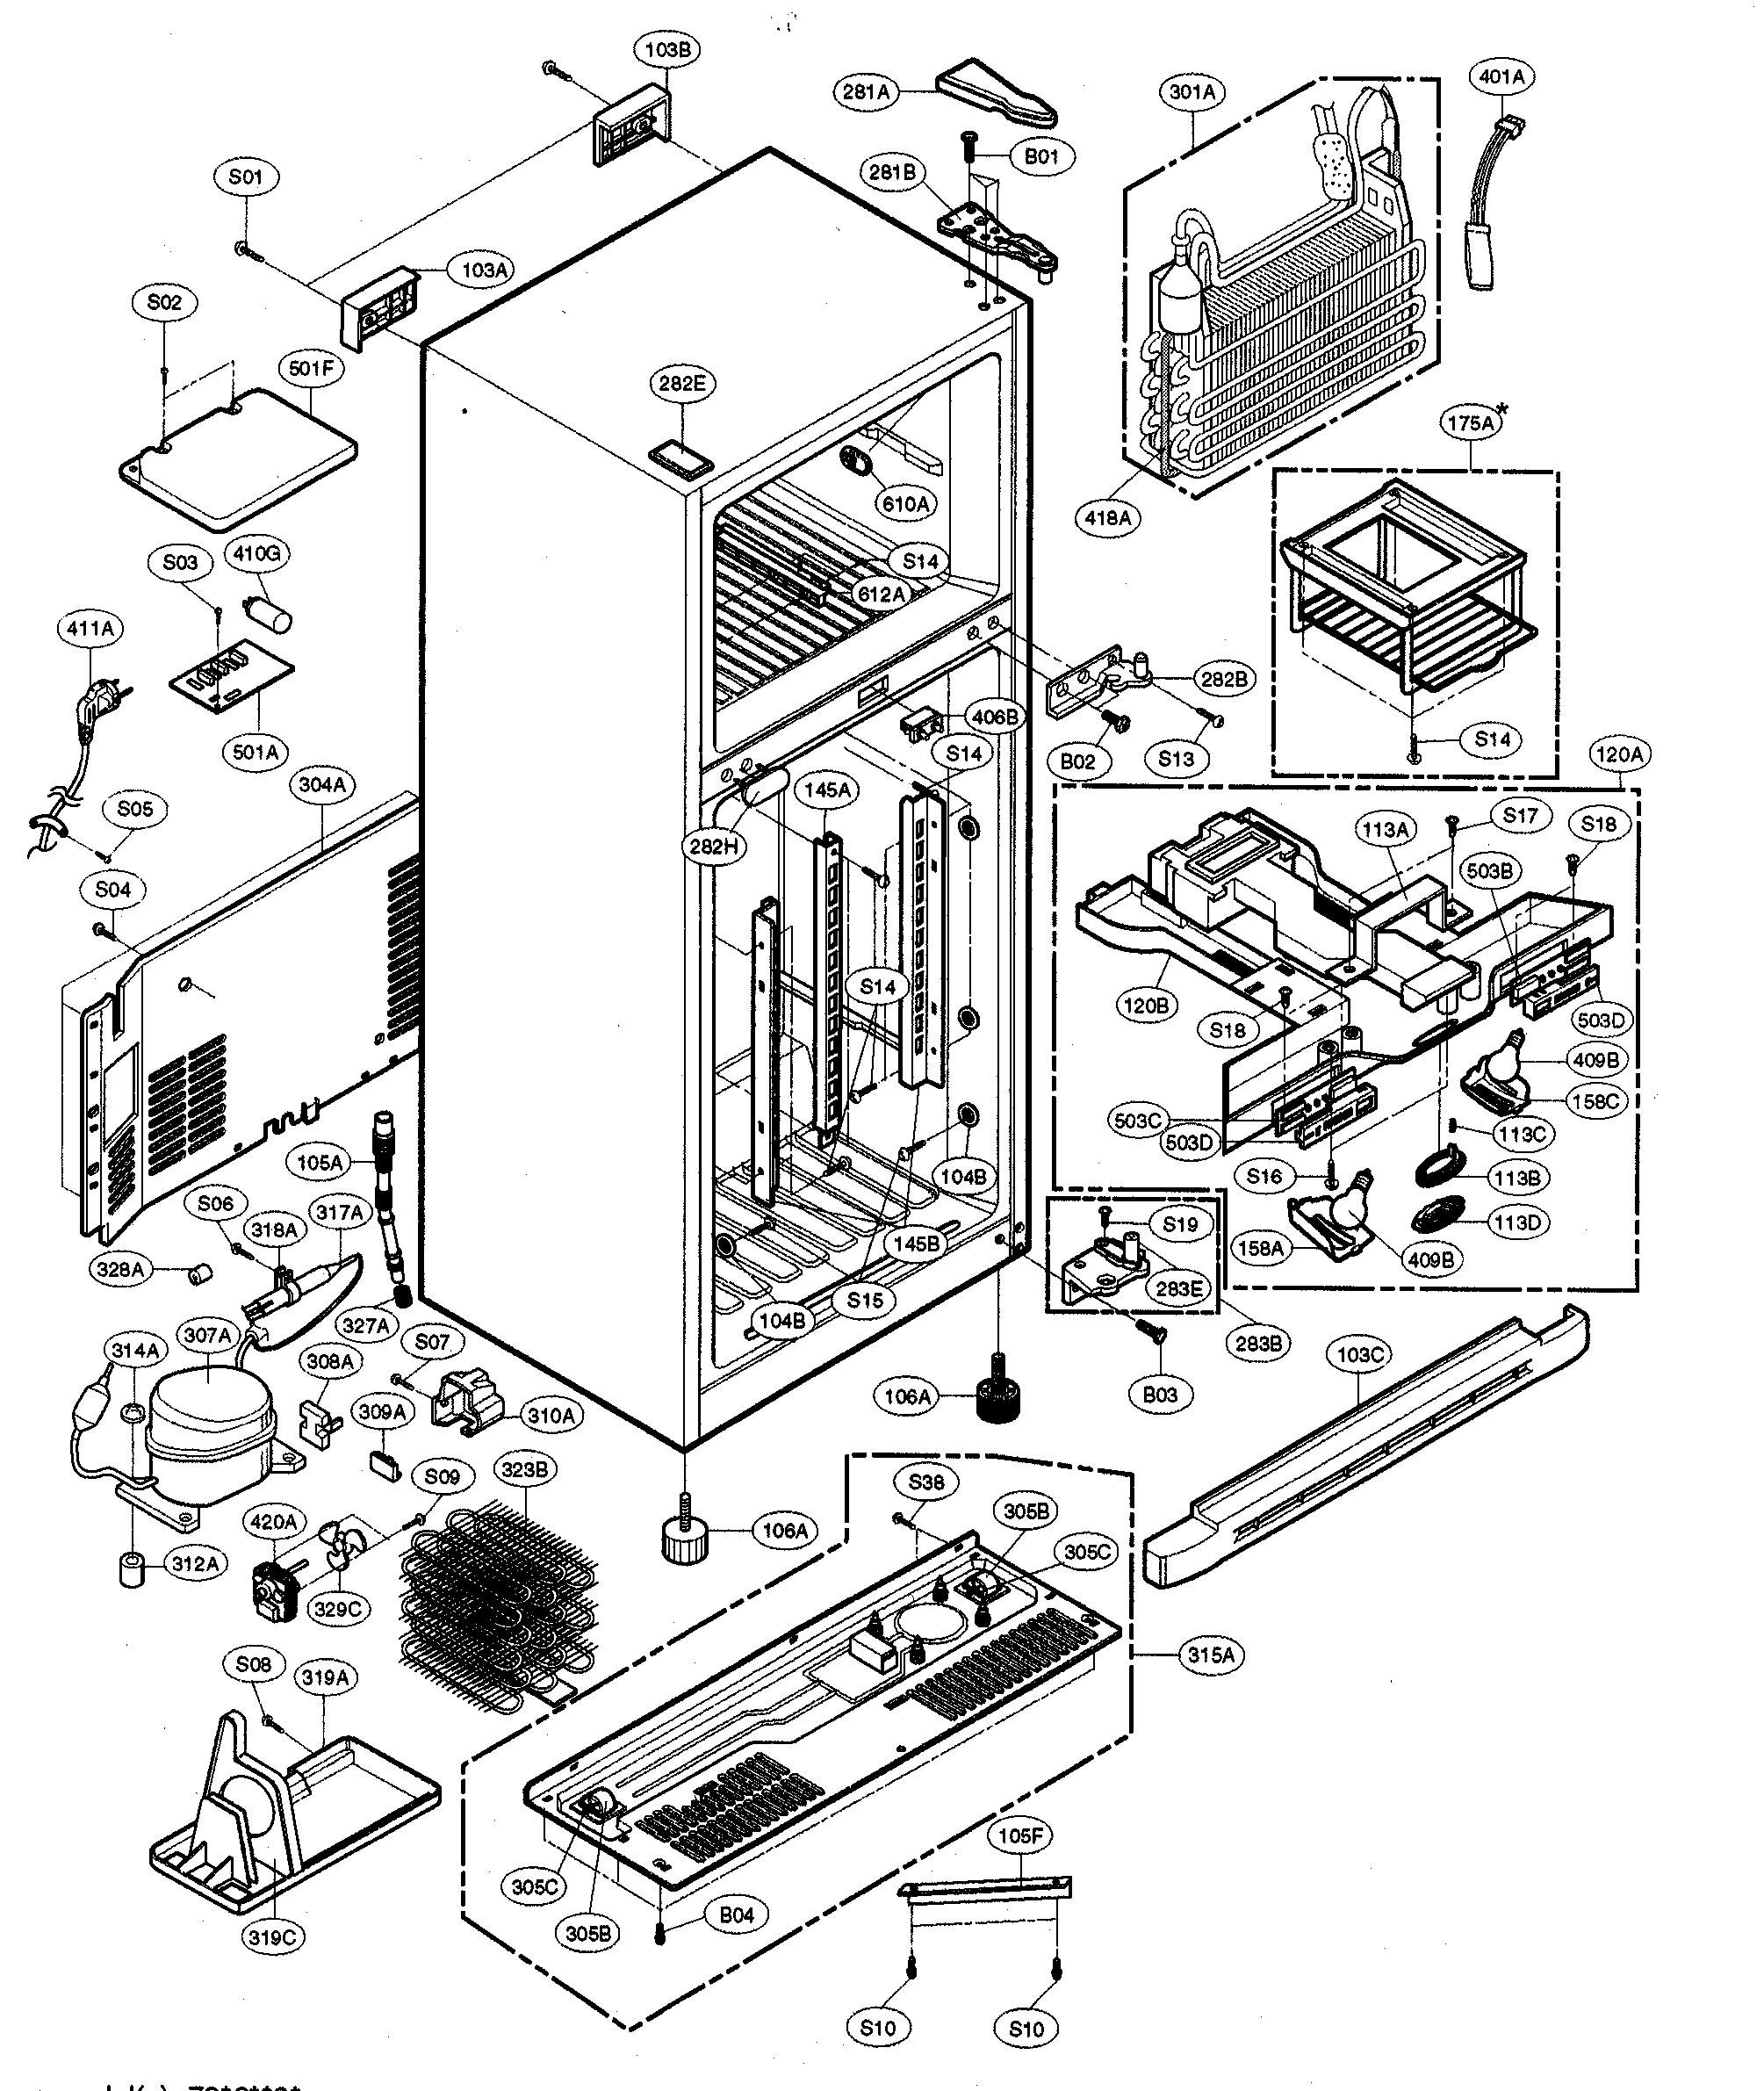 Refrigerator Parts news: Kenmore 795 Refrigerator Parts